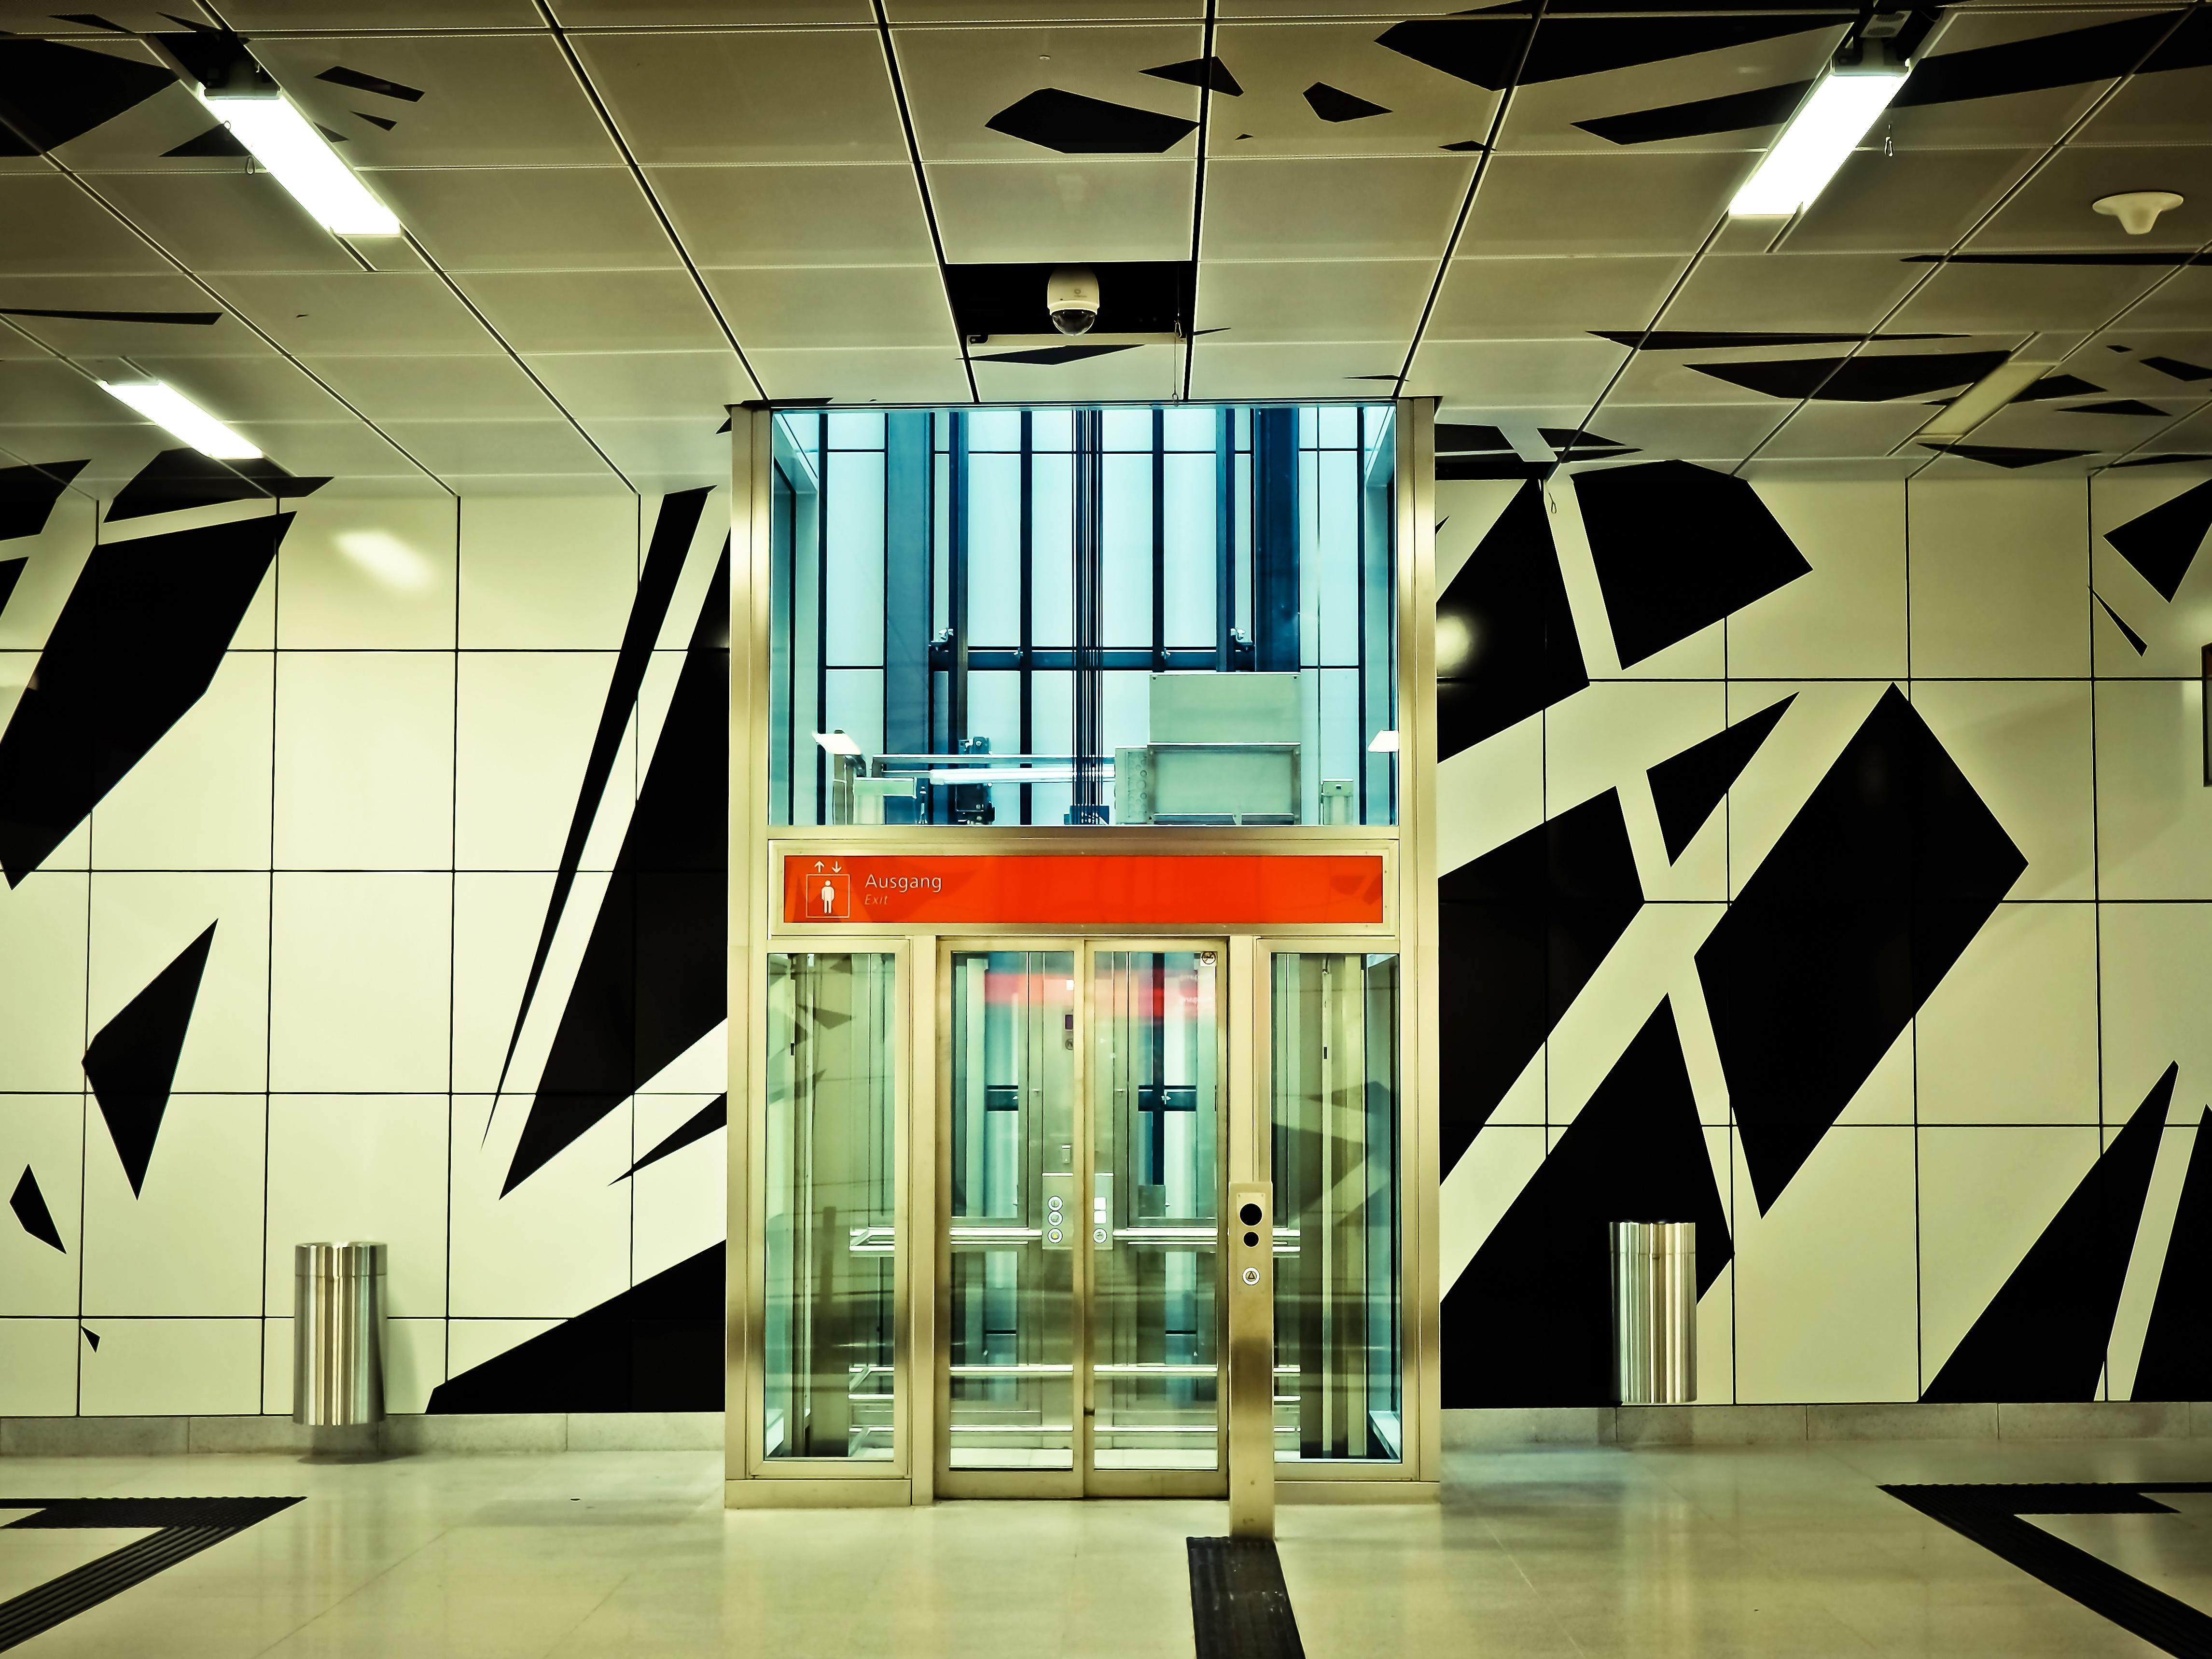 free images architecture building city train metro